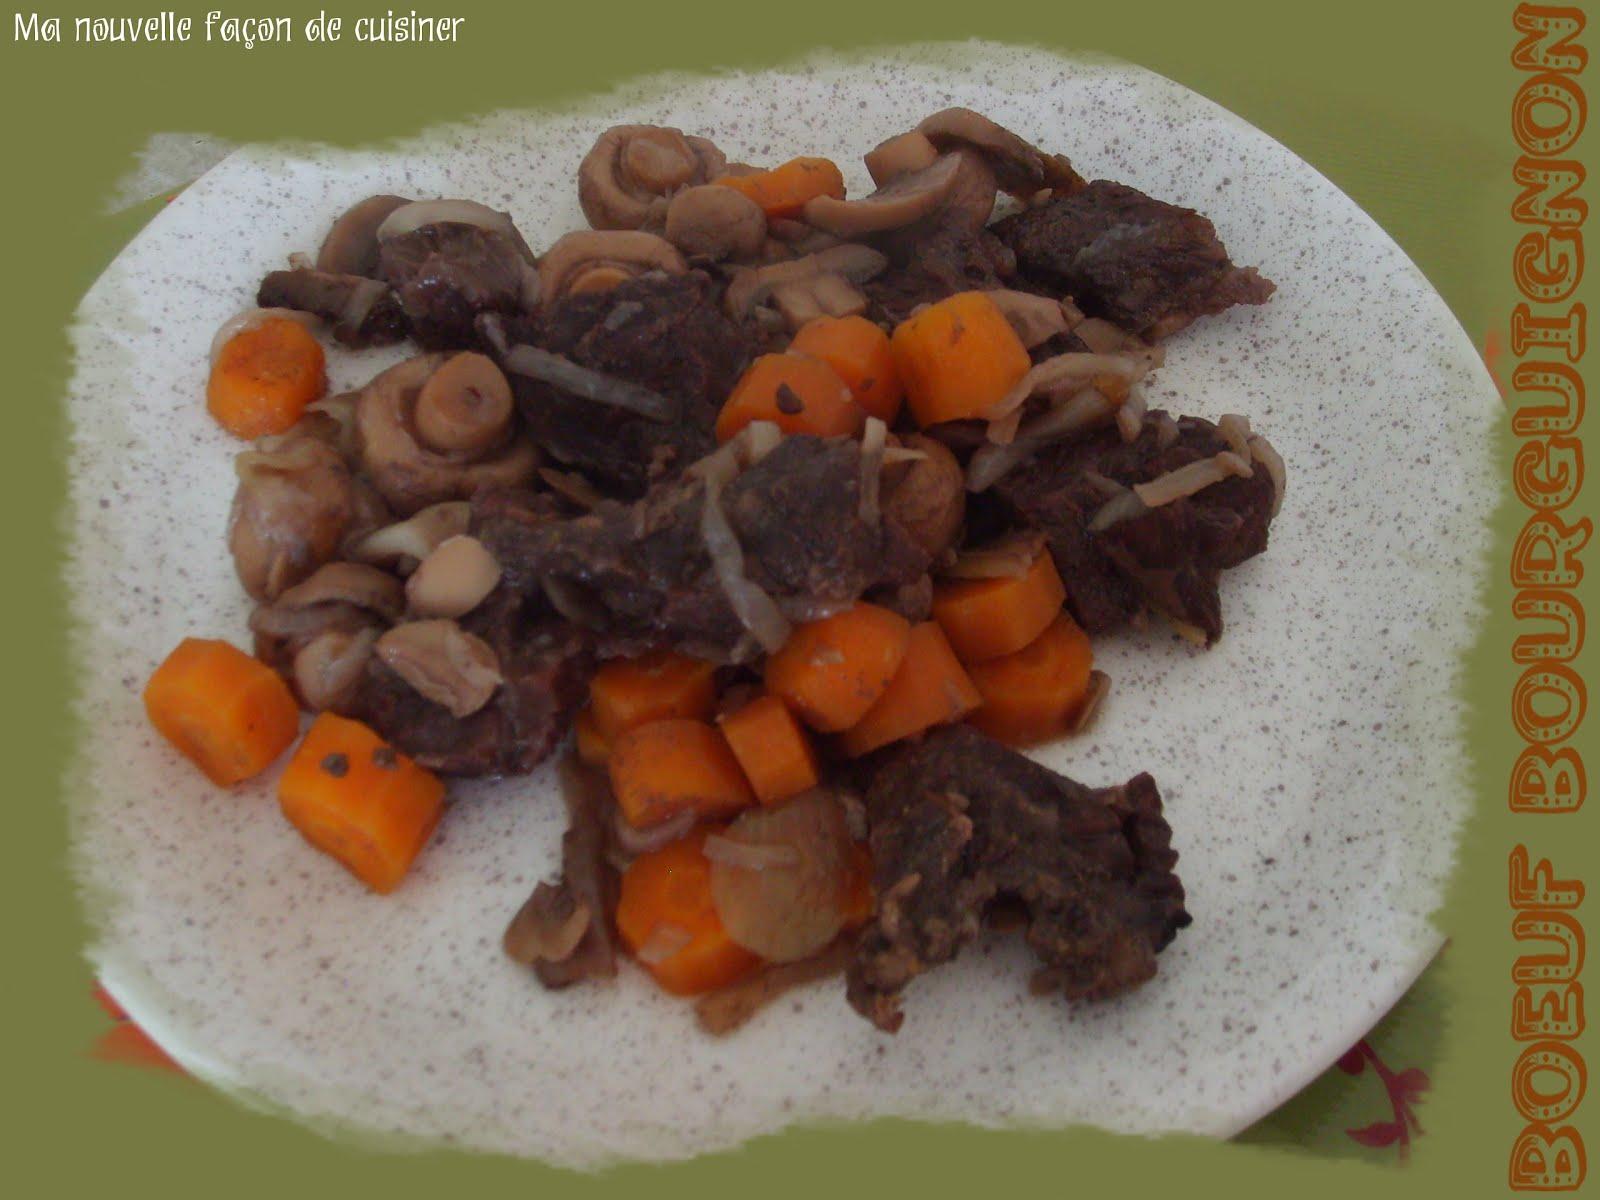 Ma nouvelle fa on de cuisiner boeuf bourguignon 6 - Cuisiner rognon de boeuf ...